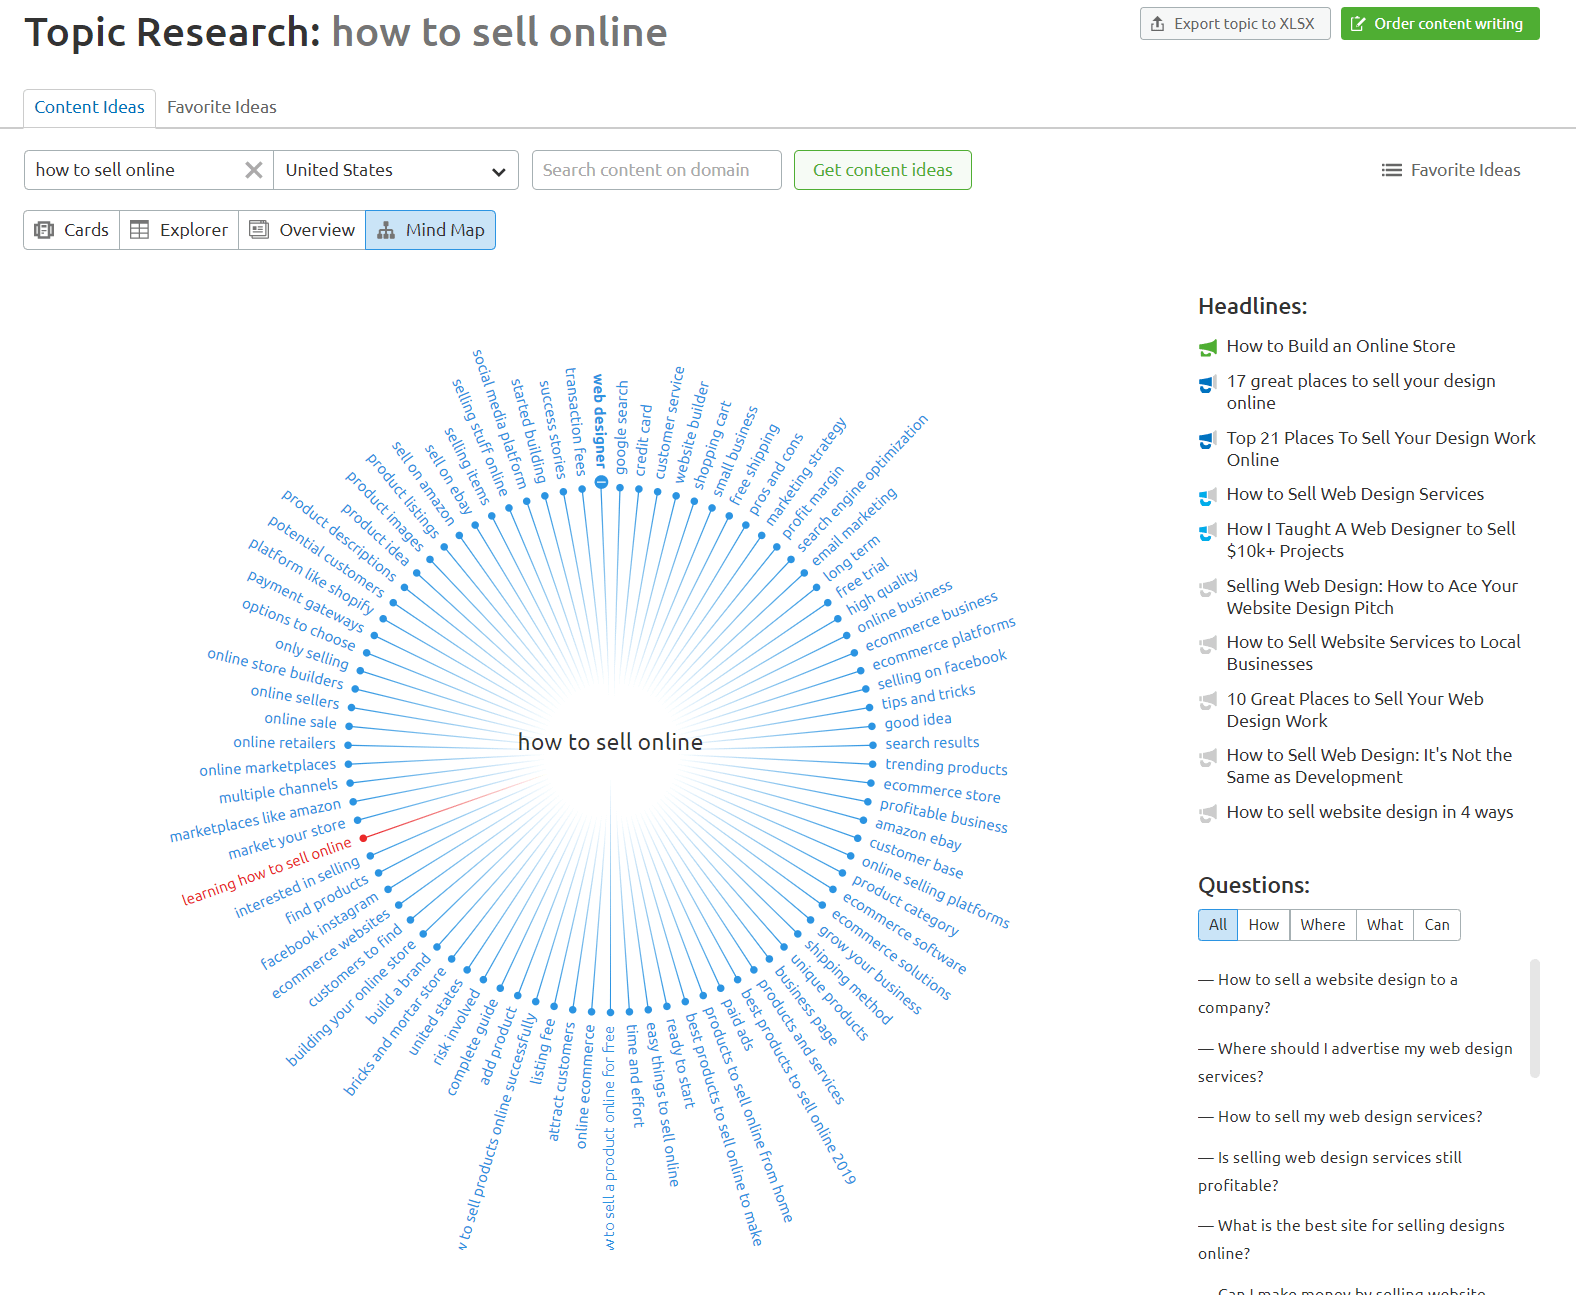 keyword recommendations - SEMrush review